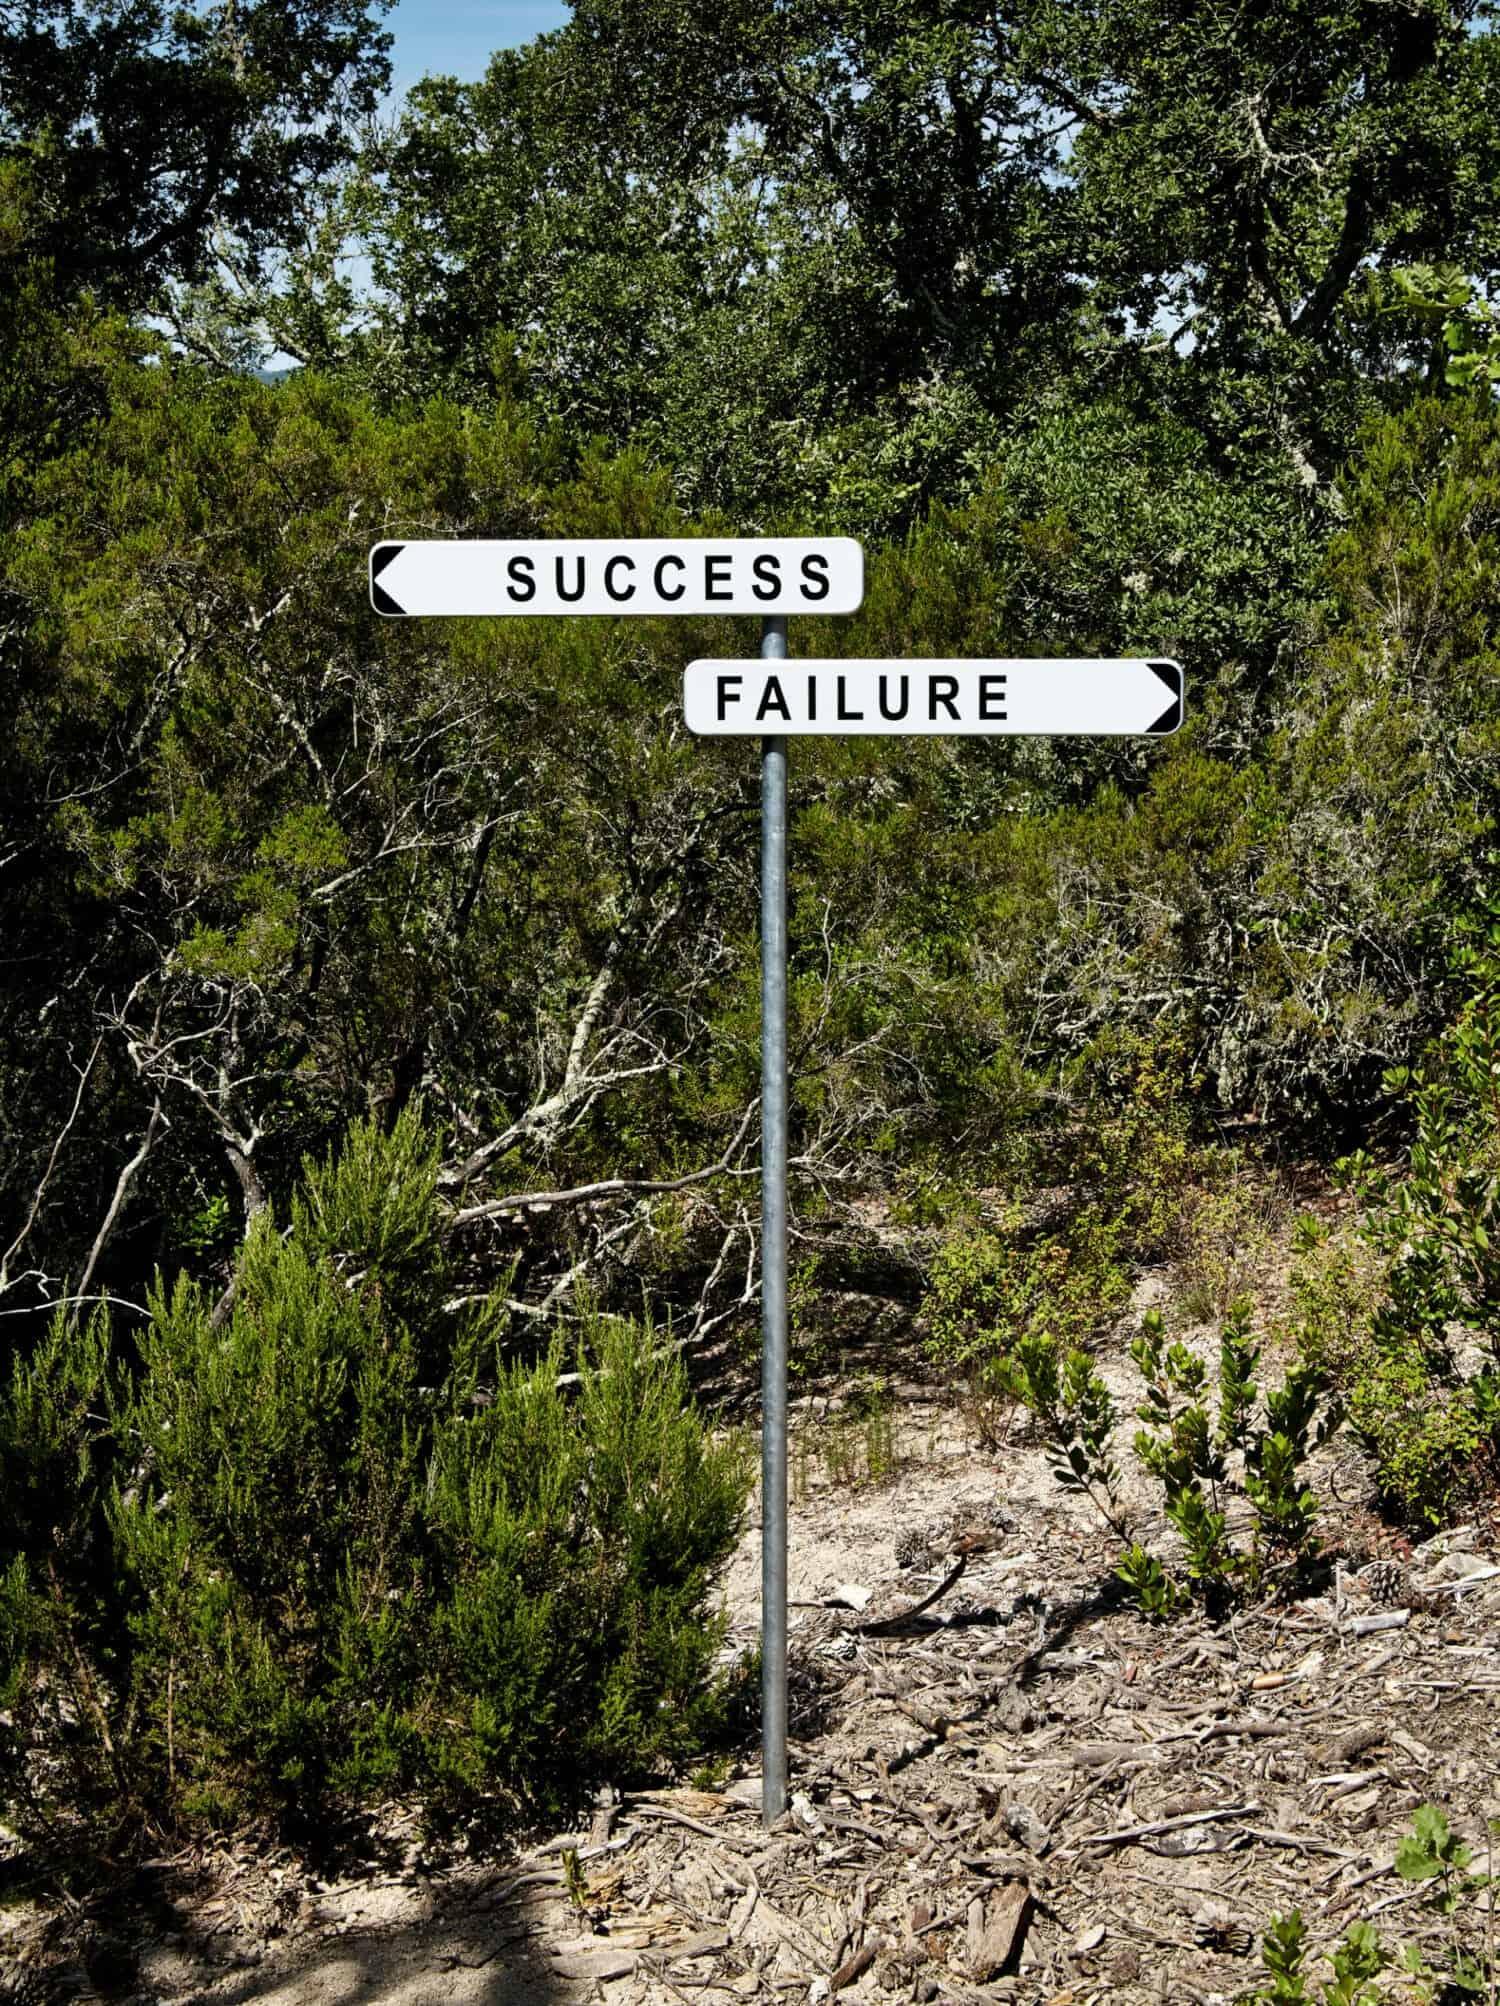 Gianni Motti, Success Failure, 2014, Domaine du Muy, 83 chemin des Leonards, 83490 Le Muy, France. Courtesy Ardeis Genève et Domaine du Muy. © Gianni Motti. Photo: JC Lett